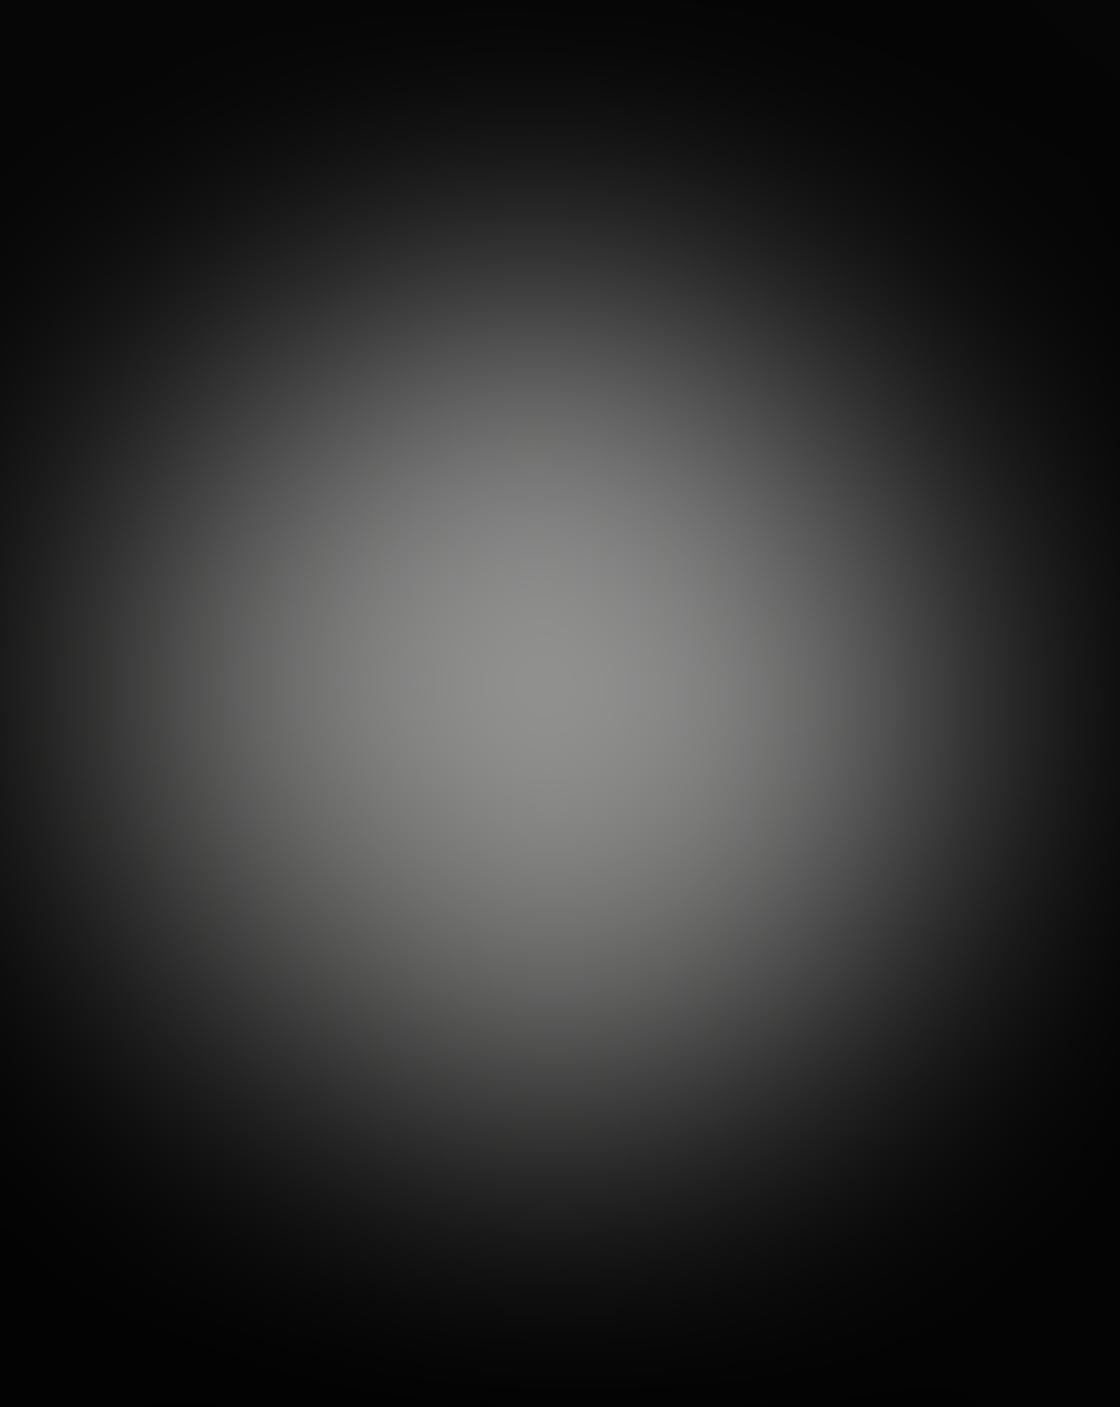 iPhone Photo Black White 24